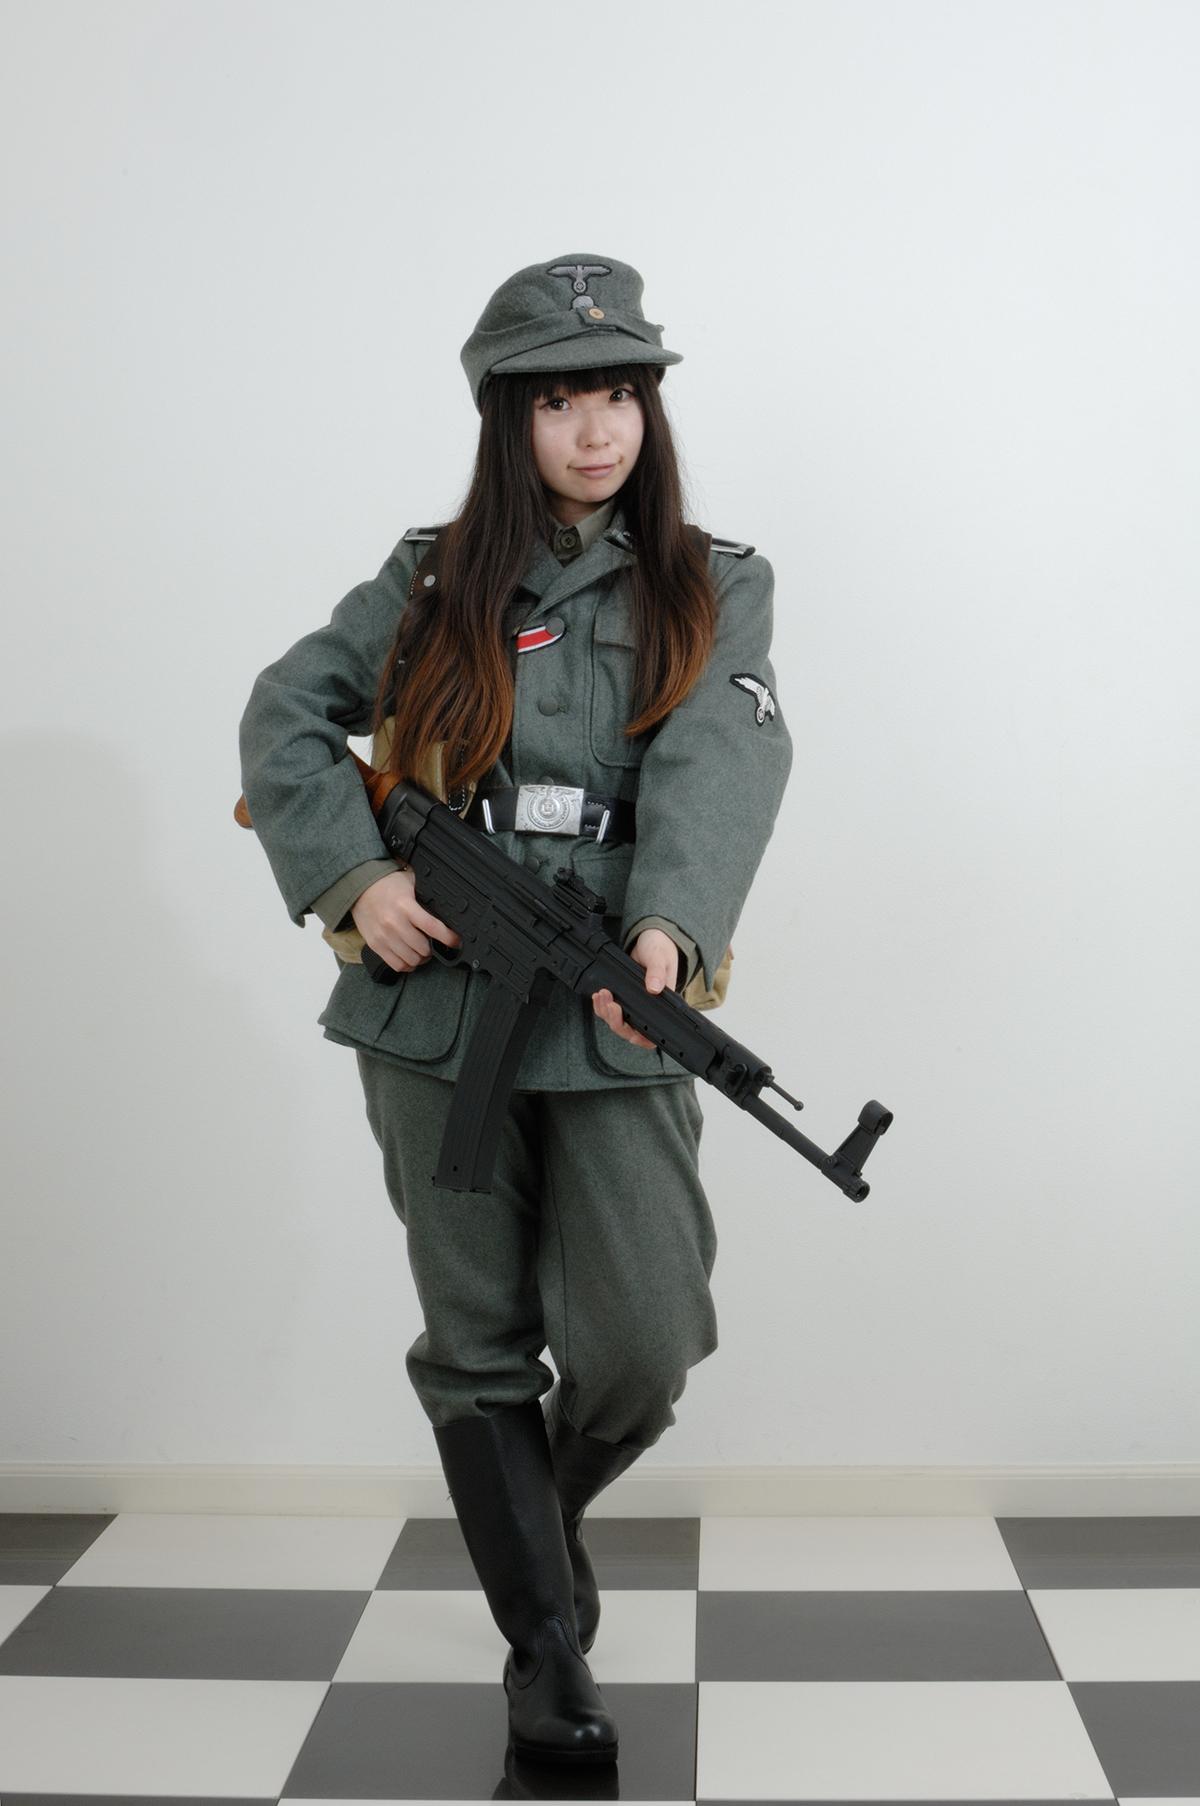 M40型ウール軍服/中国製オーダーメイド